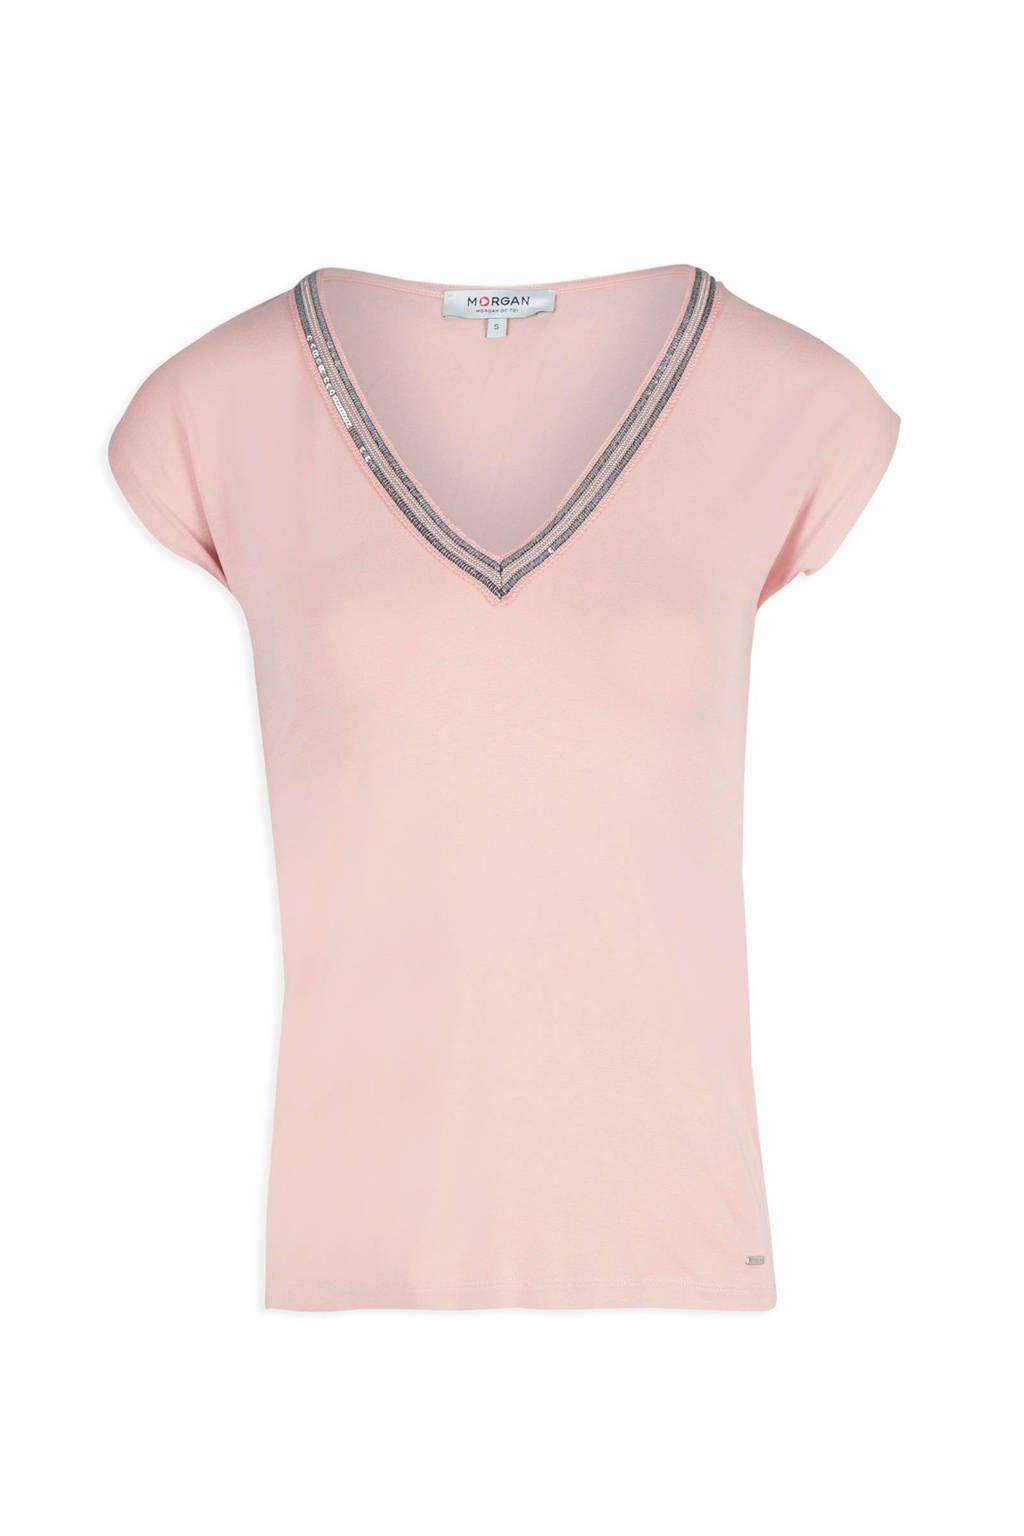 Morgan T-shirt met glitterdetail oudroze, Oudroze